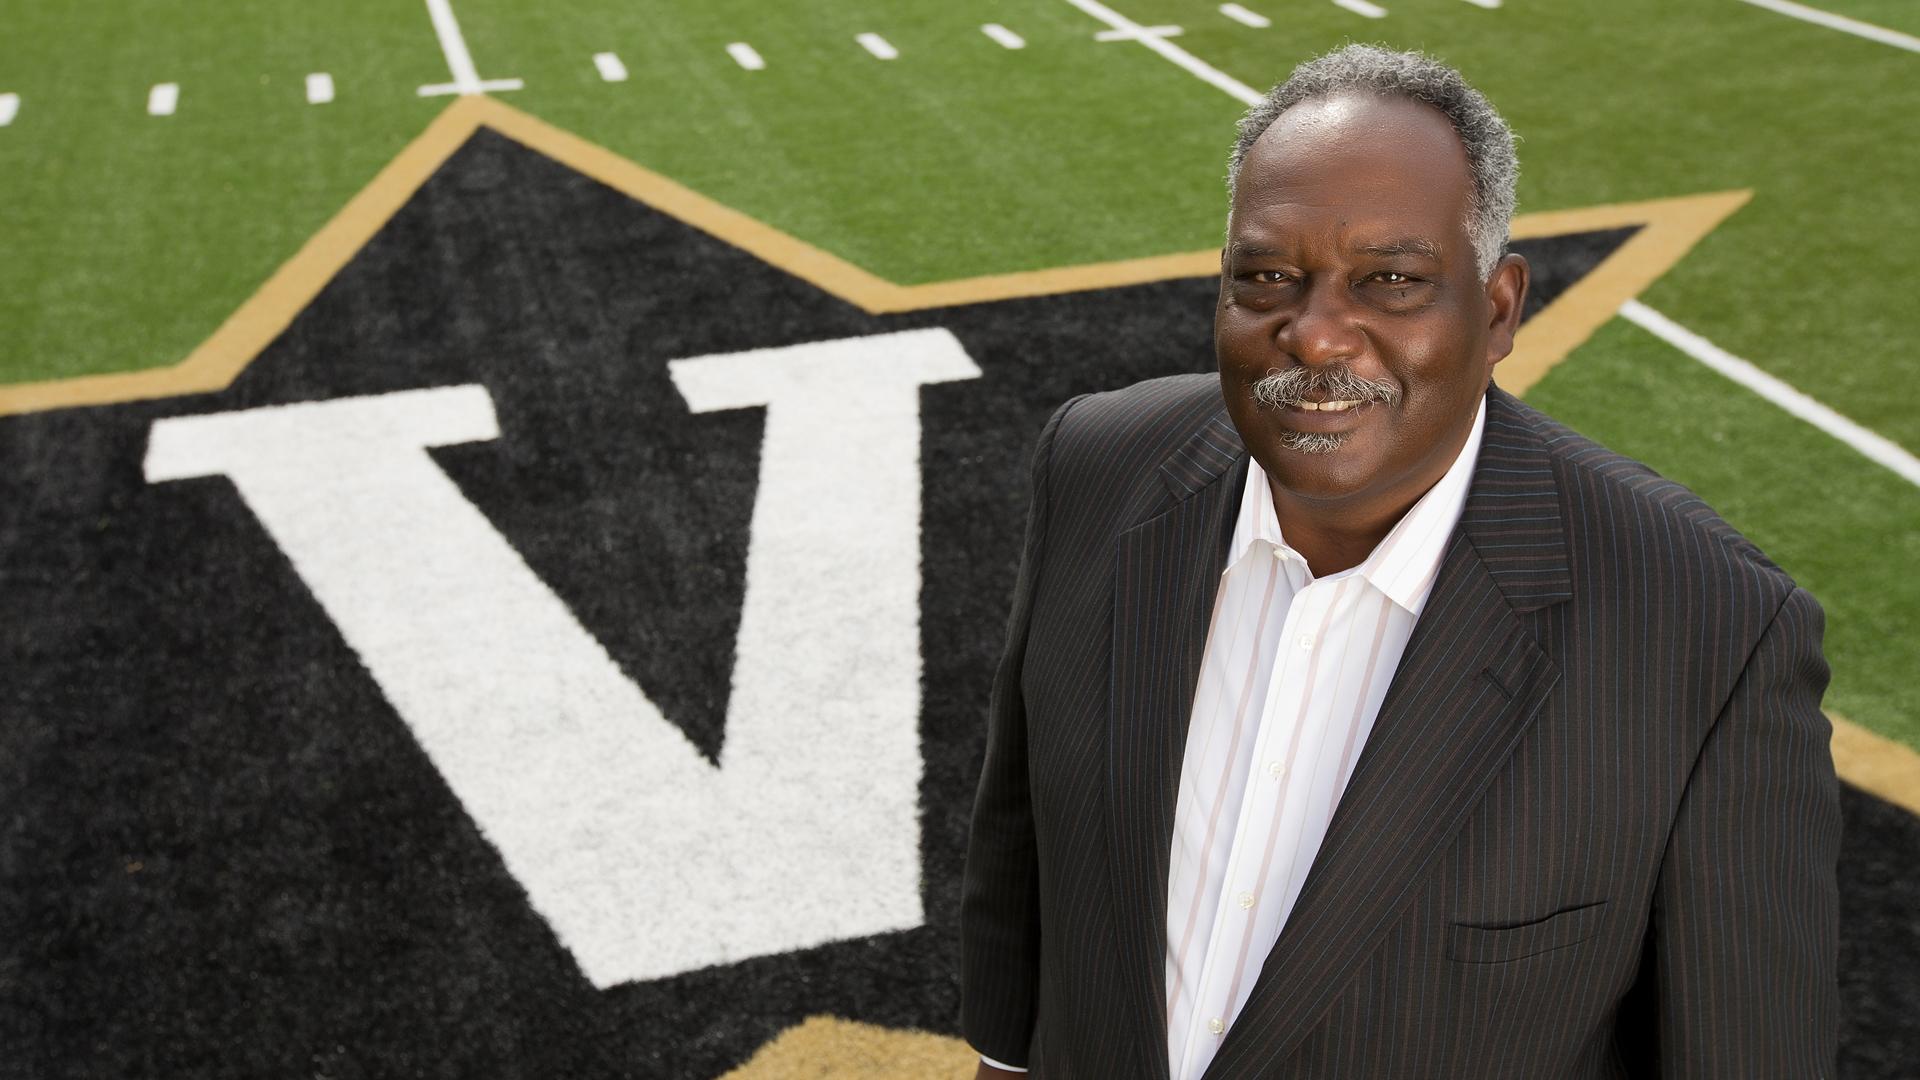 David Williams (Vanderbilt University)